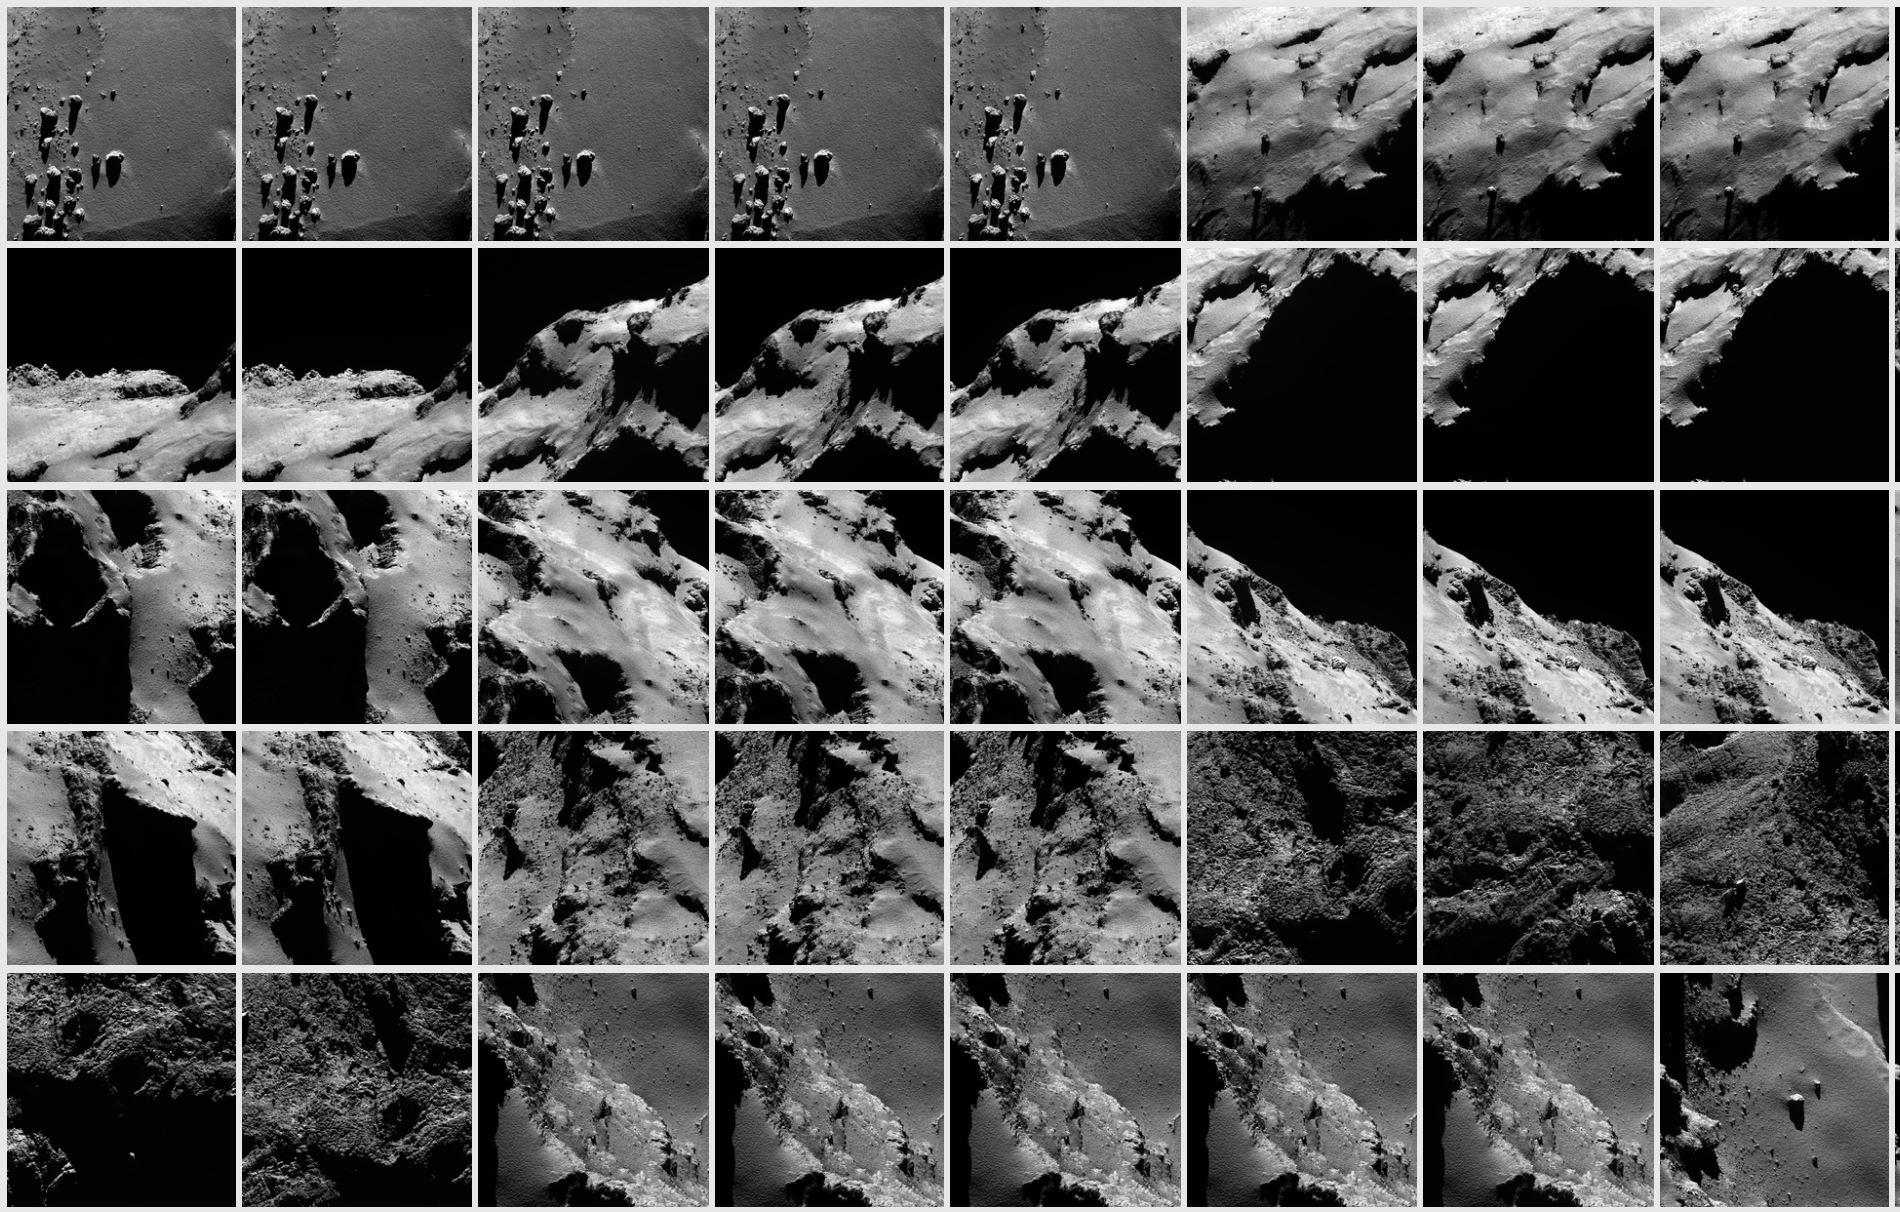 Les images de Rosetta